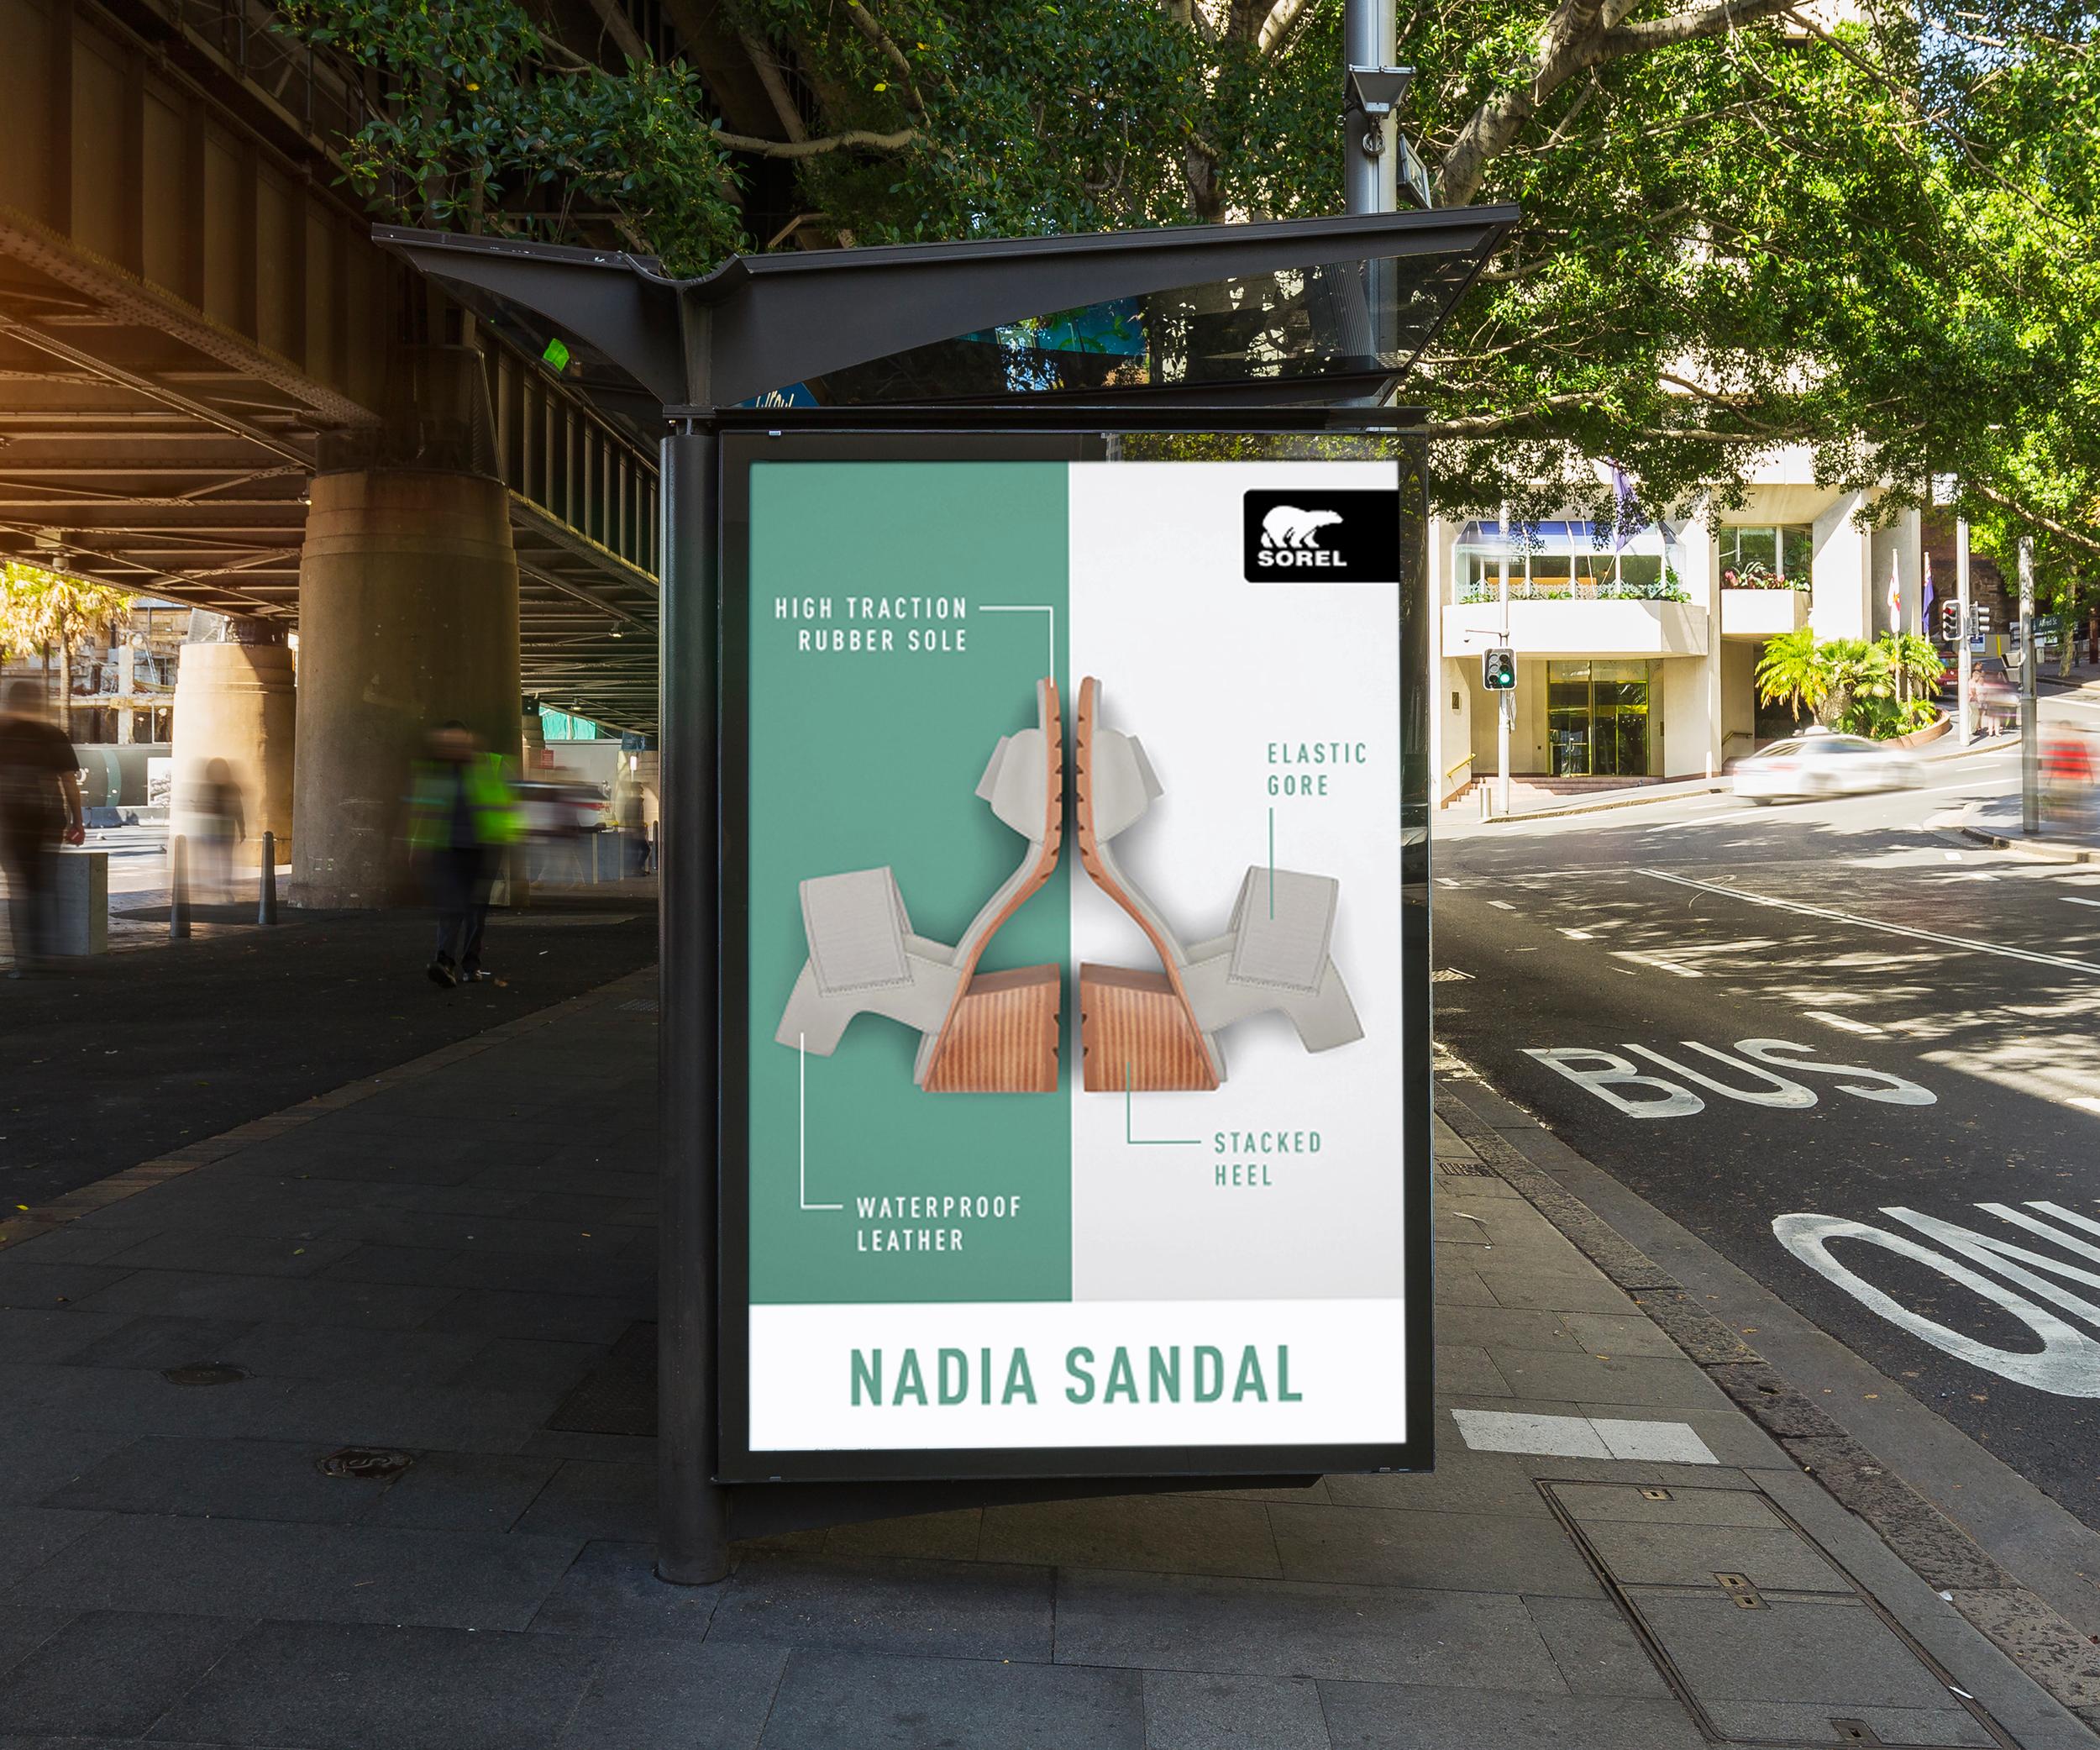 Outdoor Bus Stop Advertisement Vertical Billboard Poster Mockup PSD 2018.png